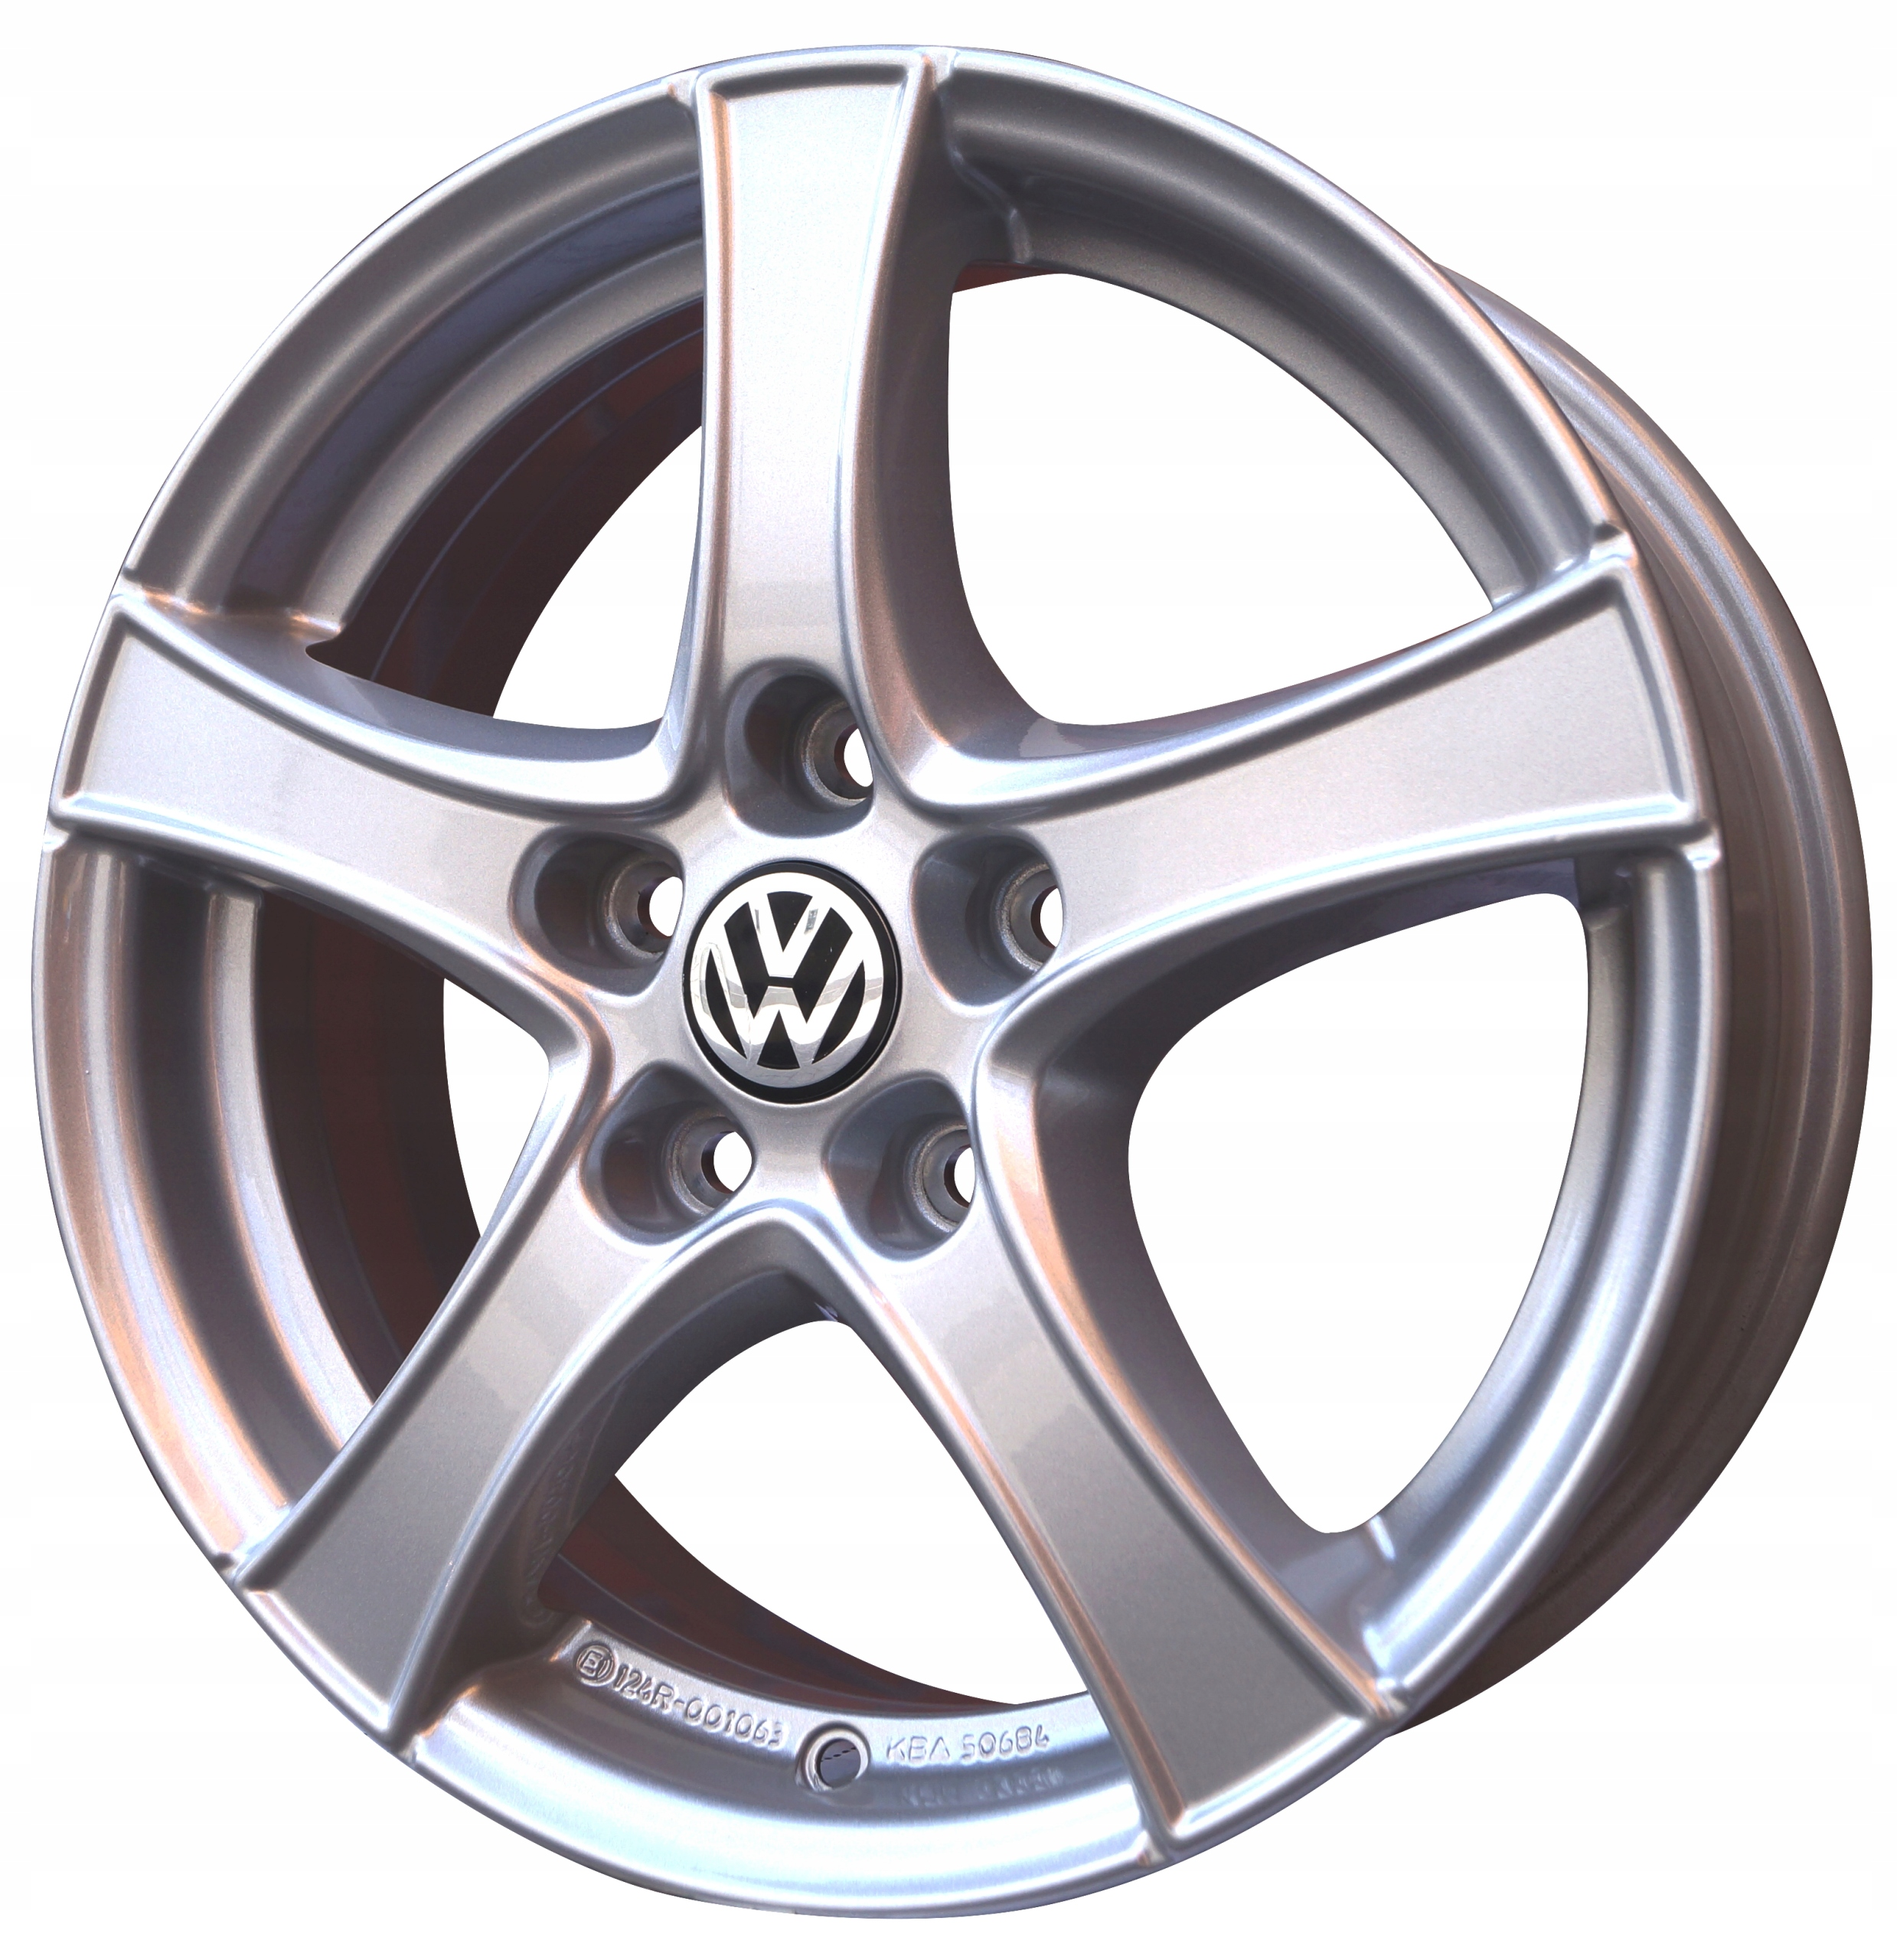 ORYGINALNE FELGI 16'' VW PASSAT GOLF TOURAN NOWE